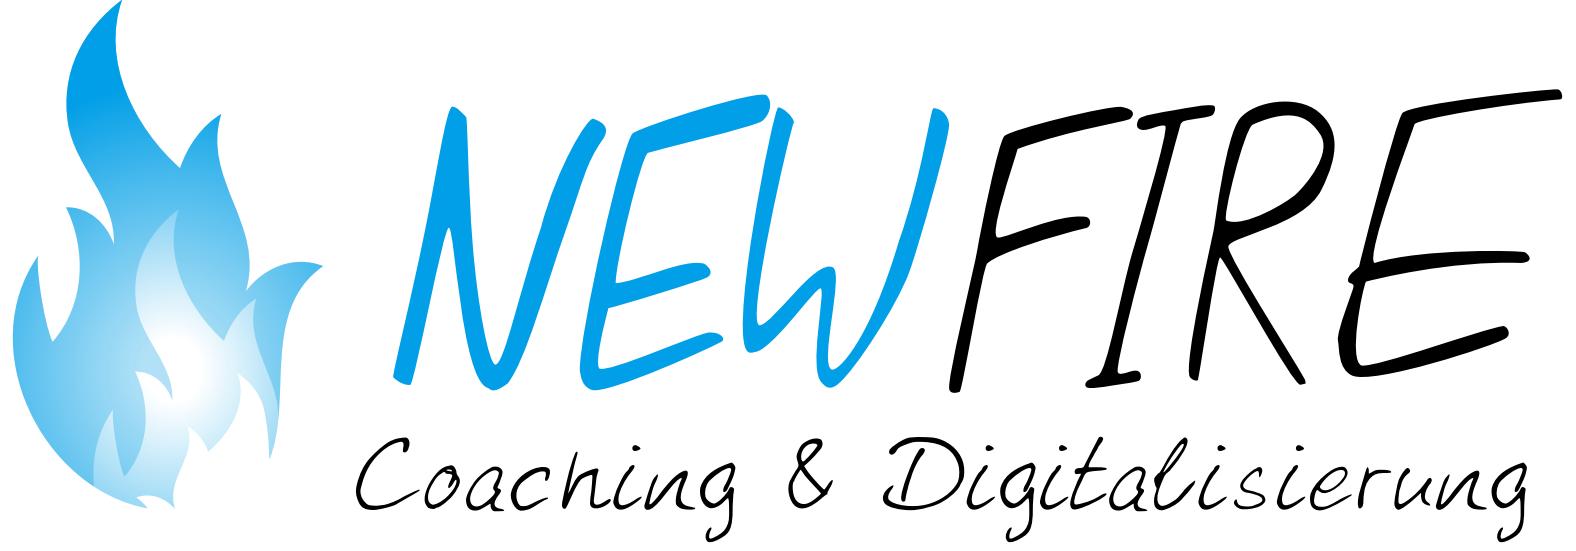 Digitalisierung Arztpraxis, QM-Tool InnovaPrax, Dienstplanung Arztpraxis, Qualitätsmanagement Arztpraxis, Datenschutz Arztpraxis